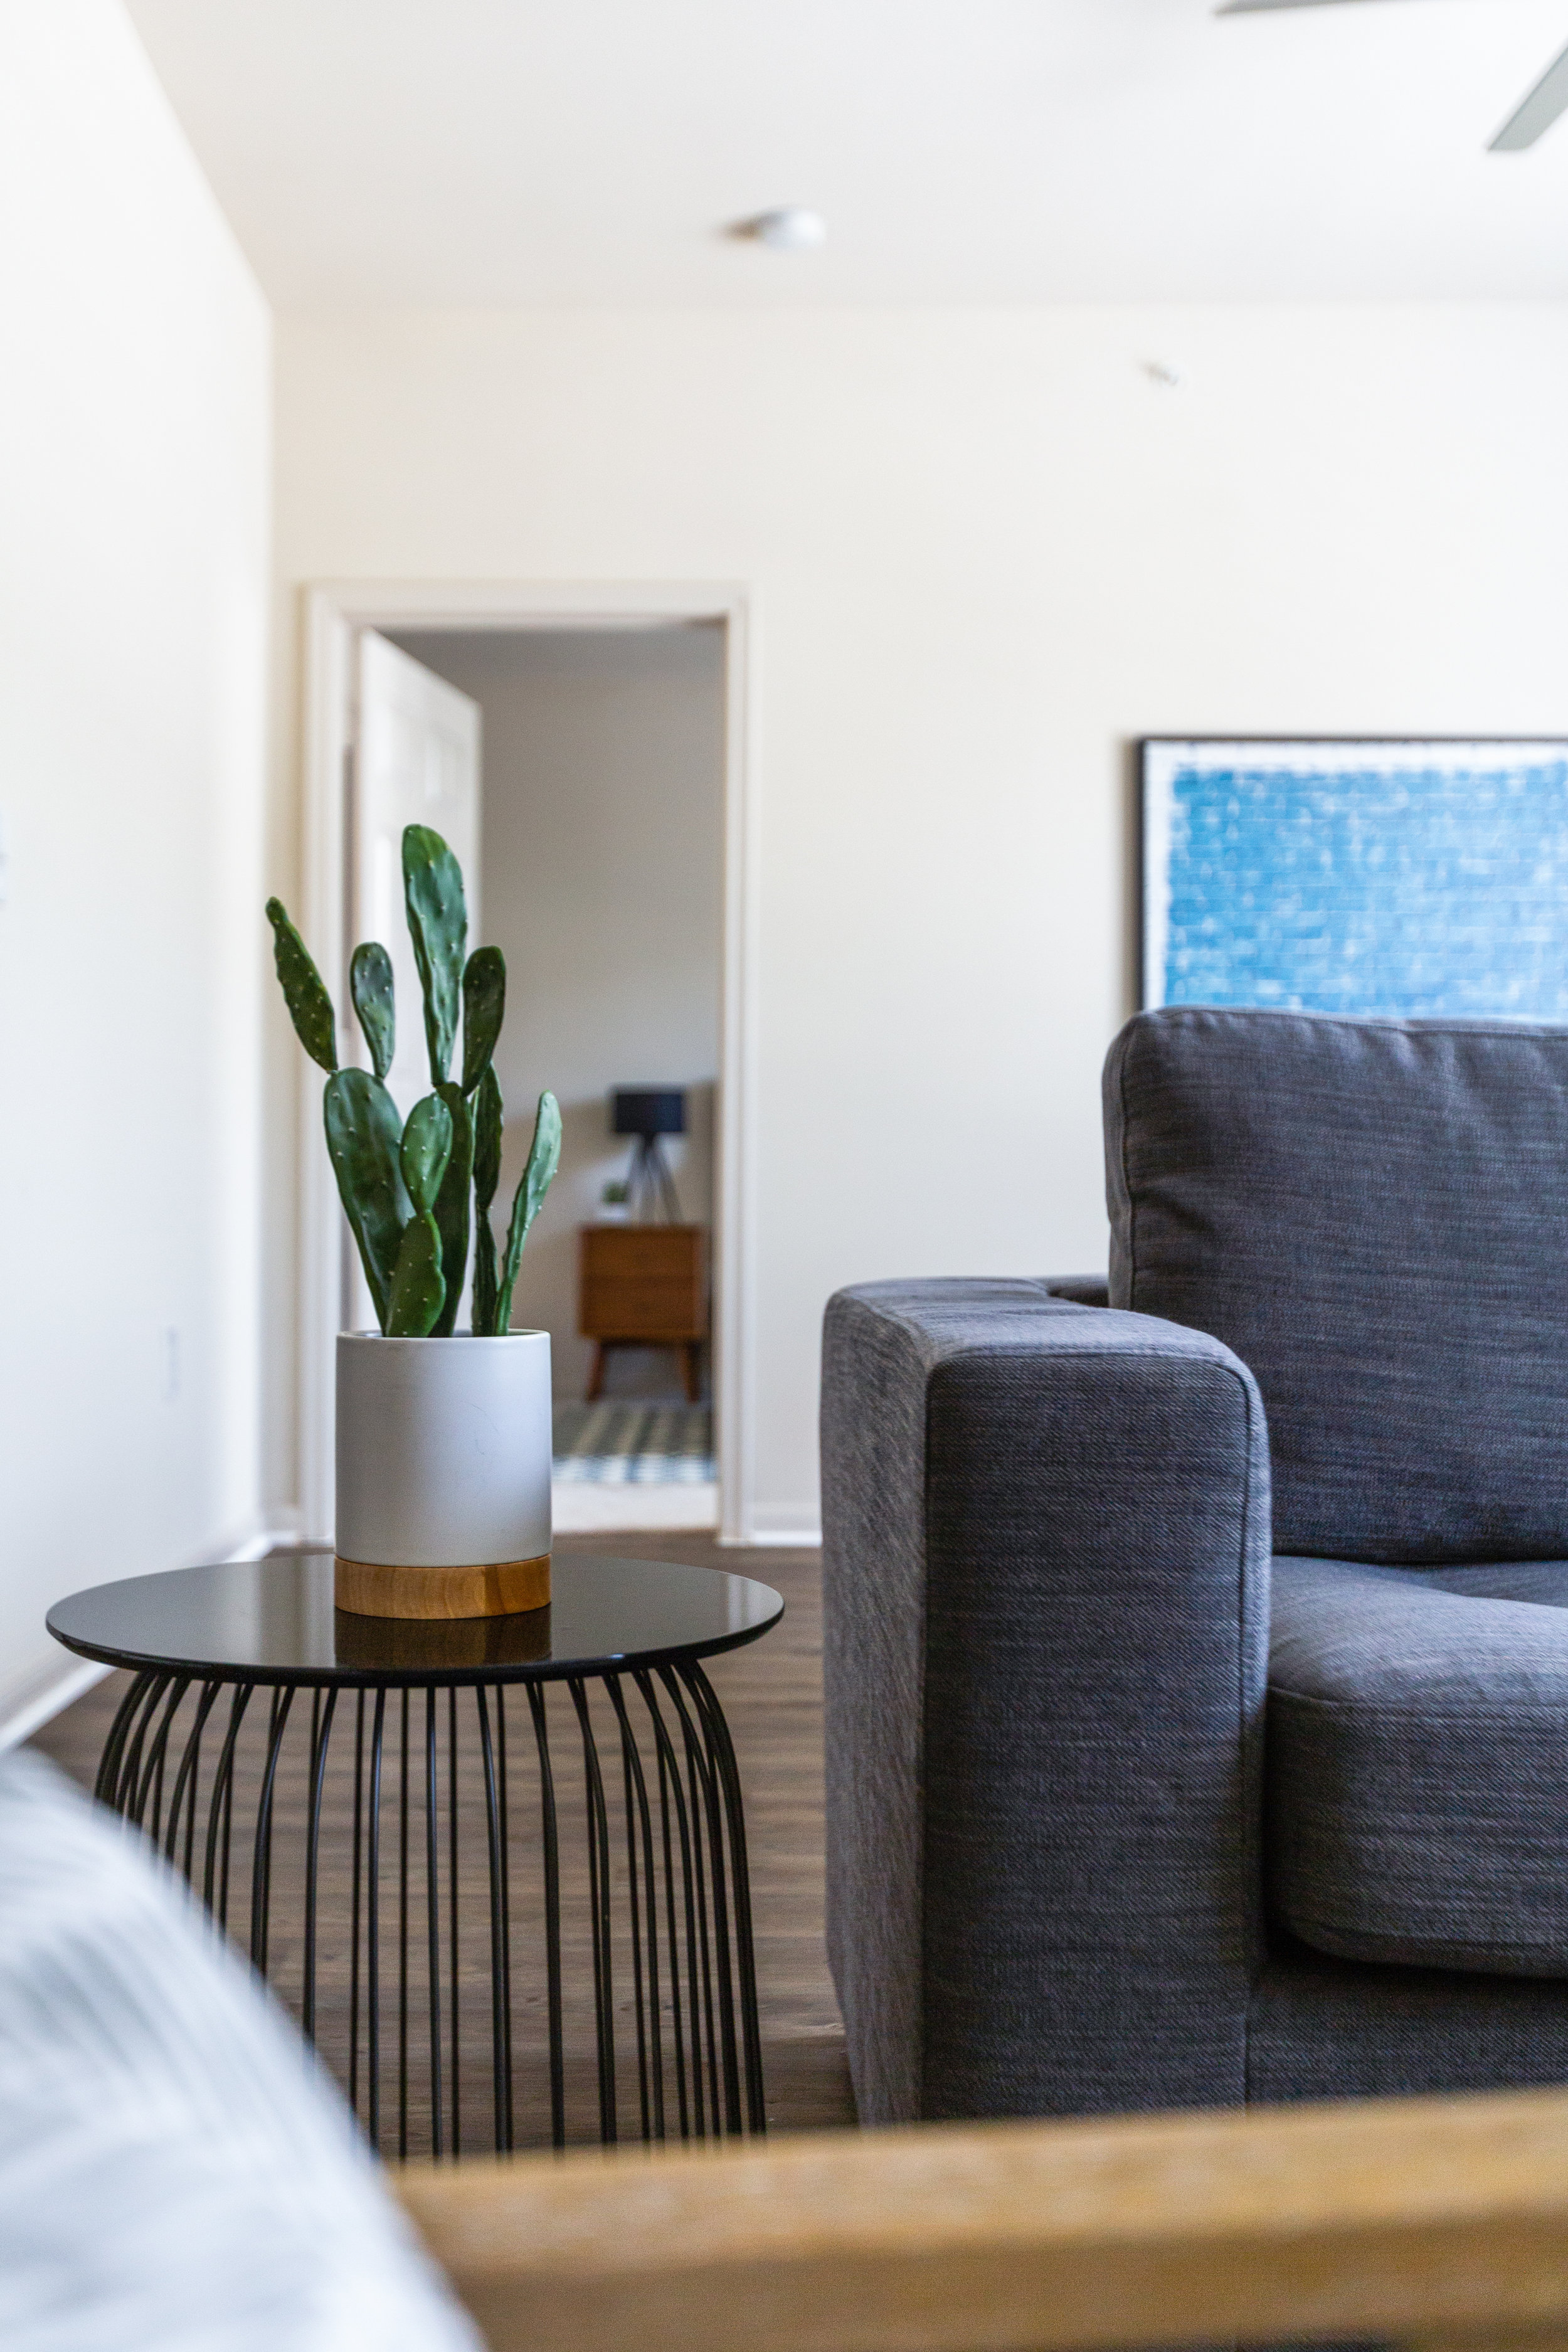 Behind-the-scenes-locale-aparthotels-short-term-rental-design-Austin-Texas-Love-Ding.jpg